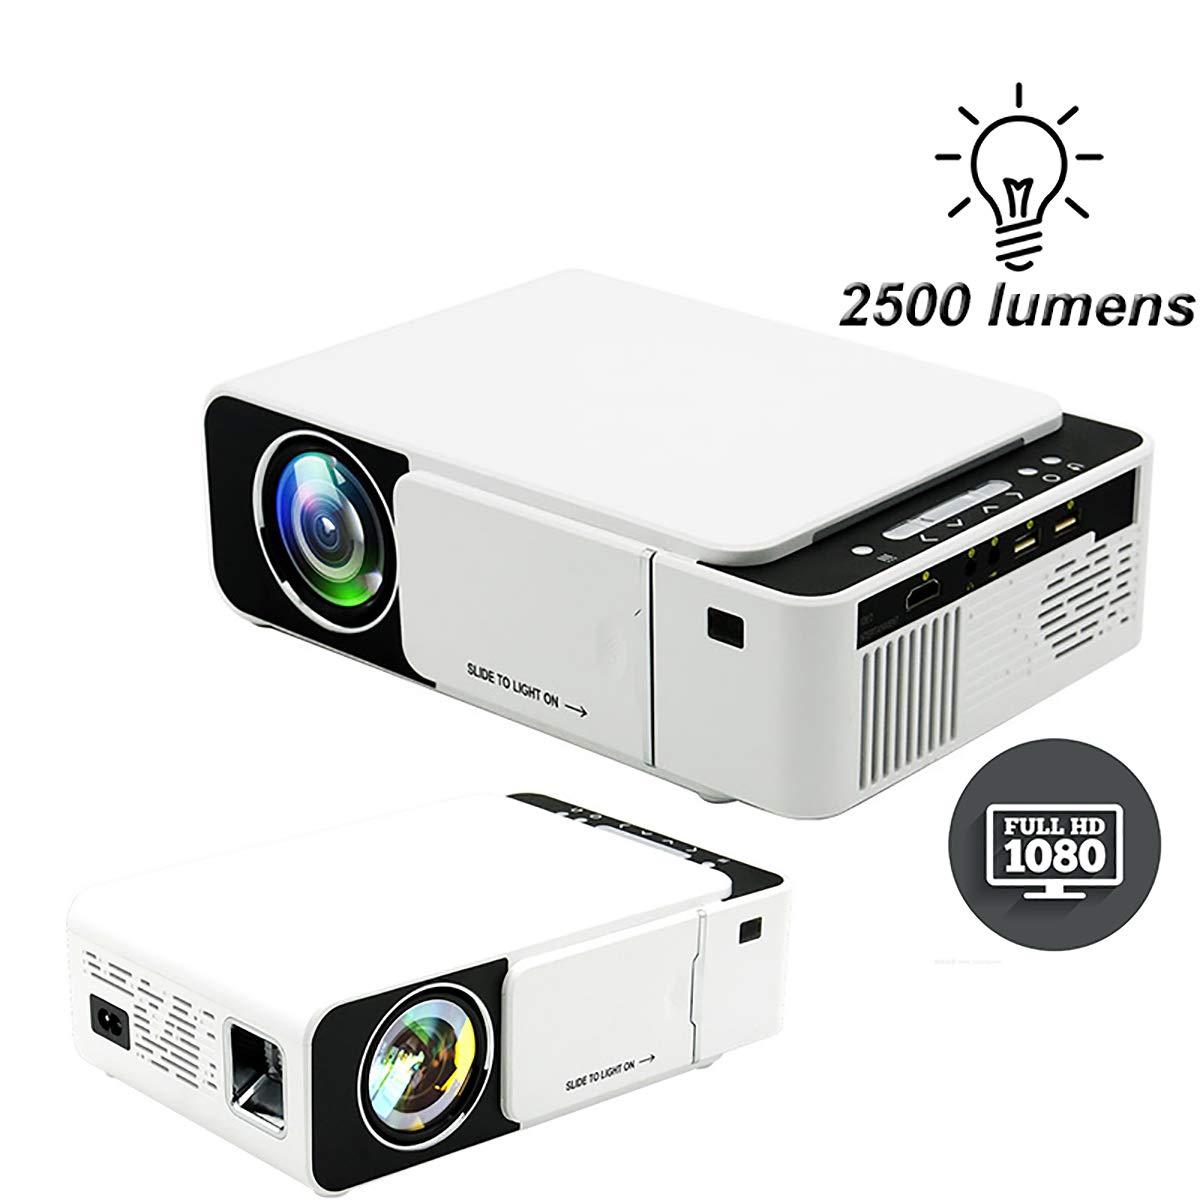 WXJHA HD LED proyector Smart 2500 lúmenes HDMI USB VGA AV Beamer ...